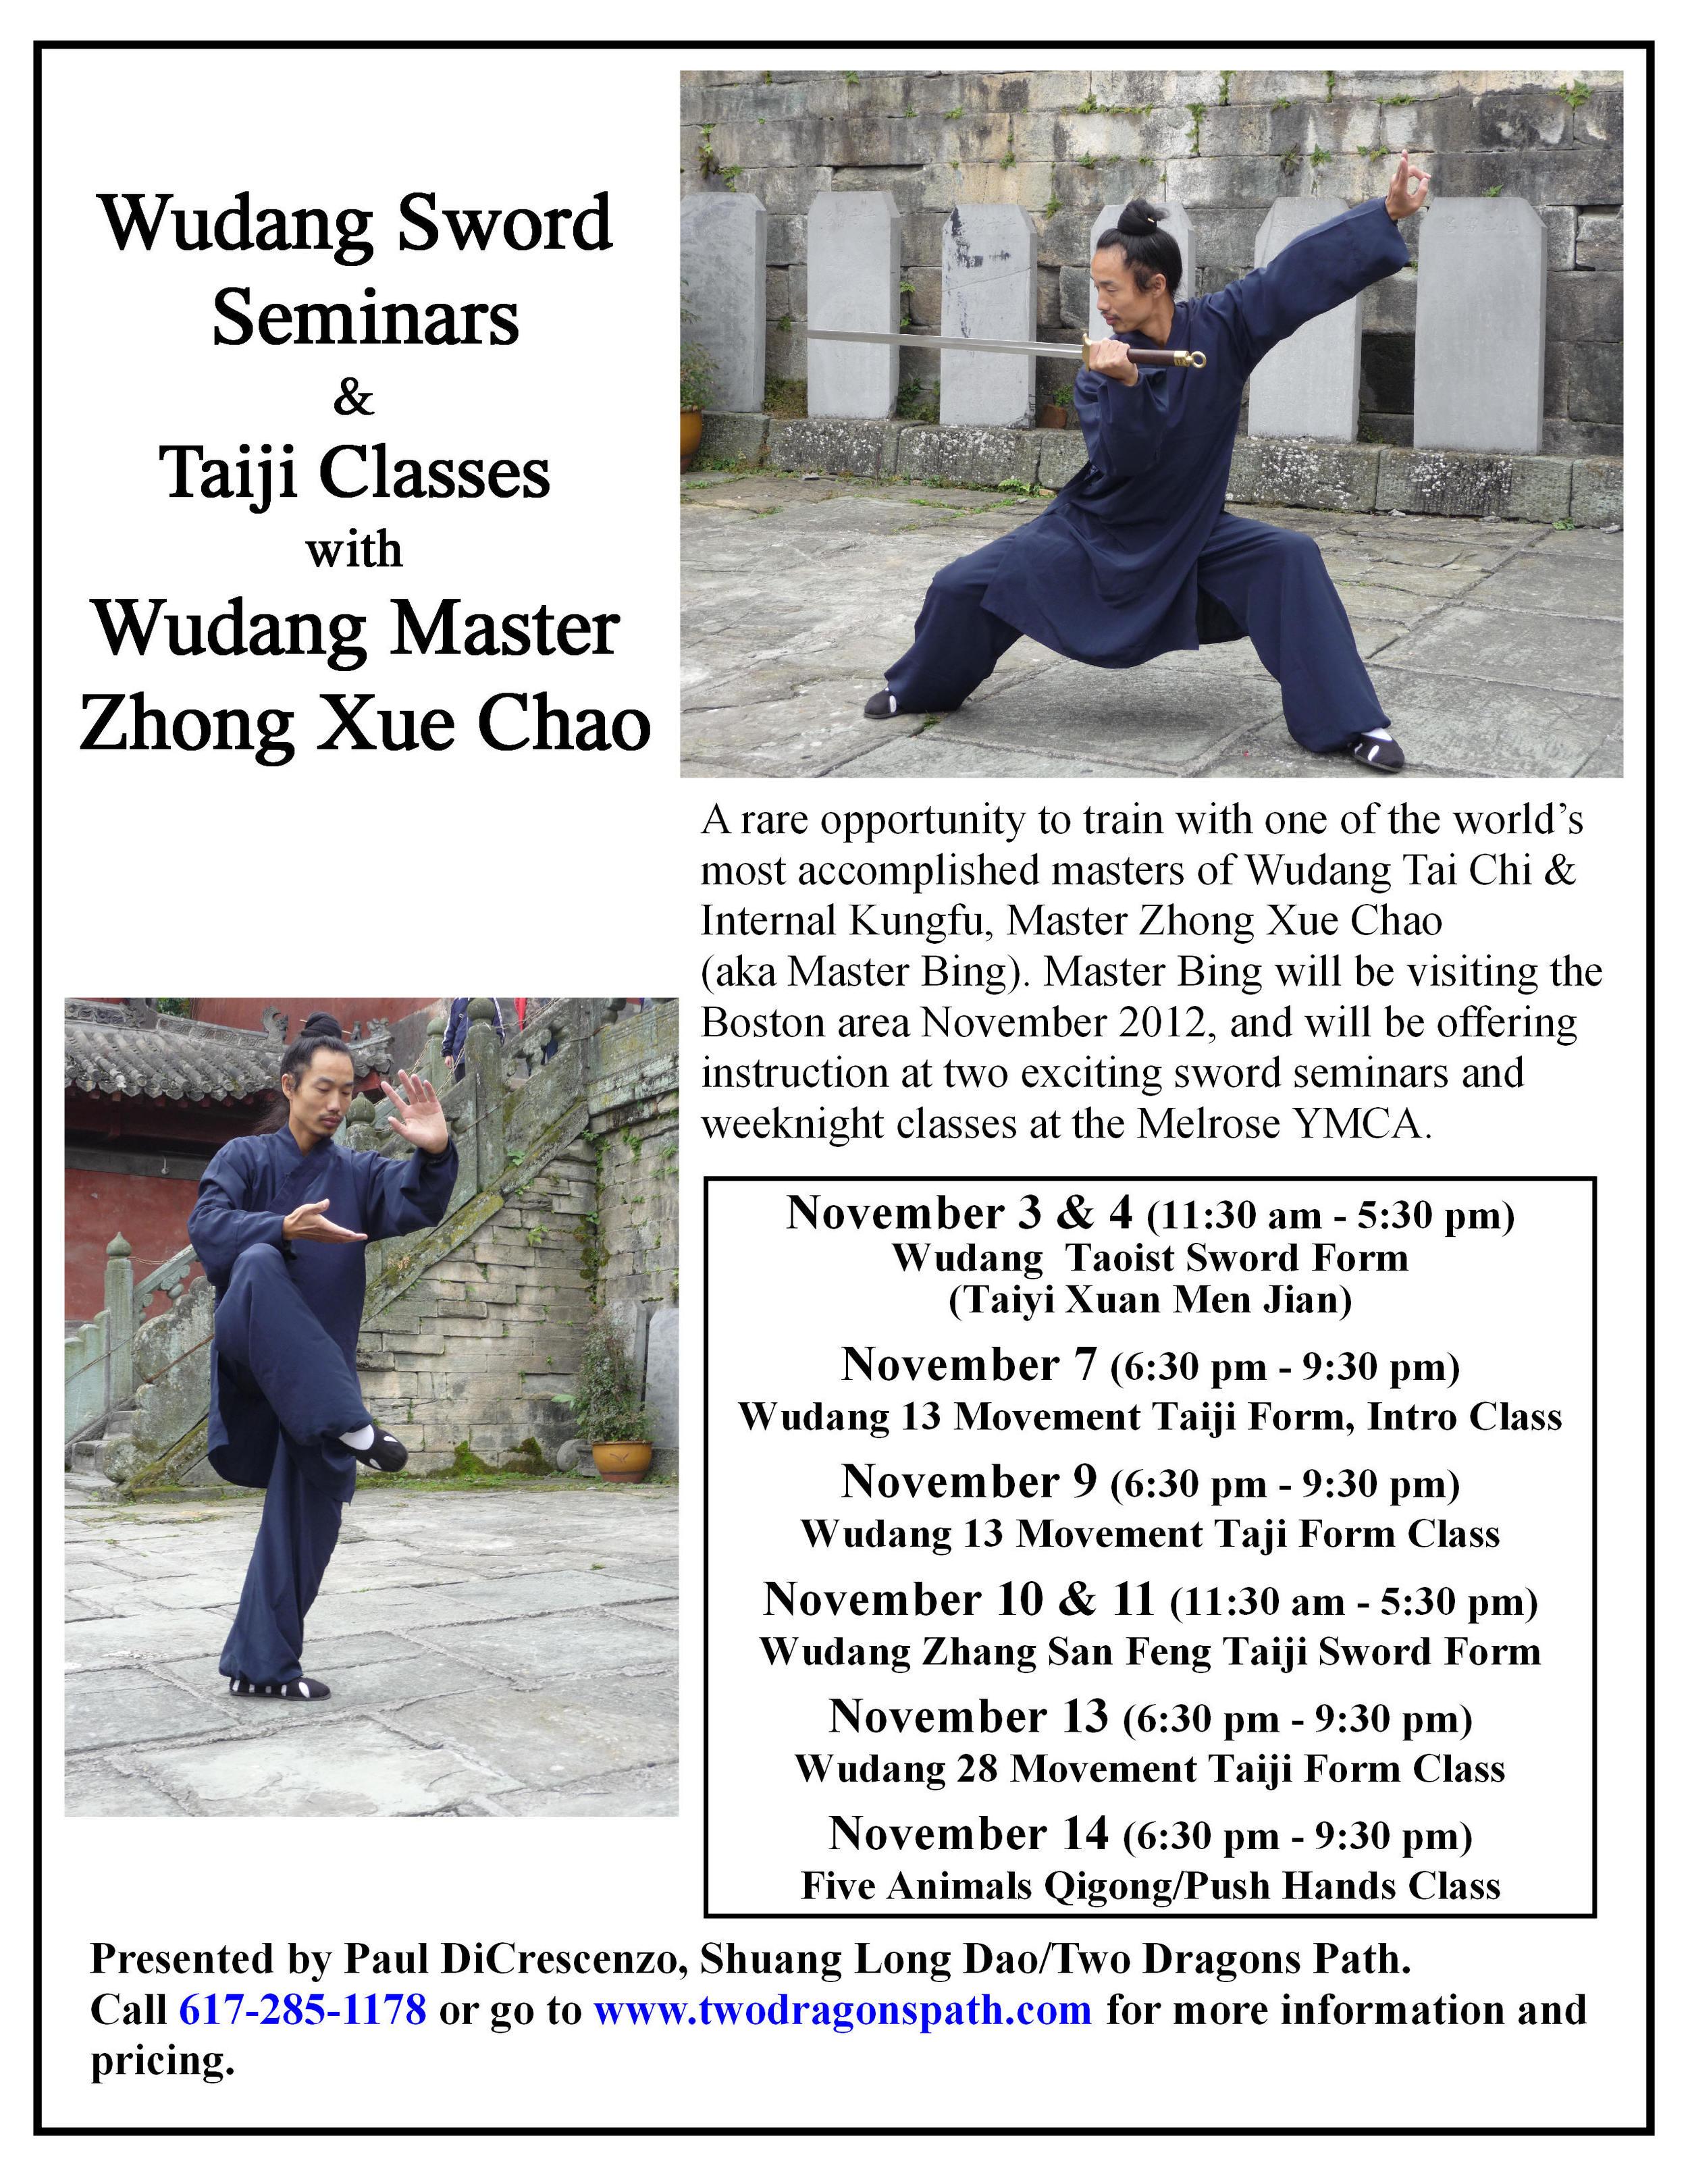 Master Bing Fall 2012 Seminars